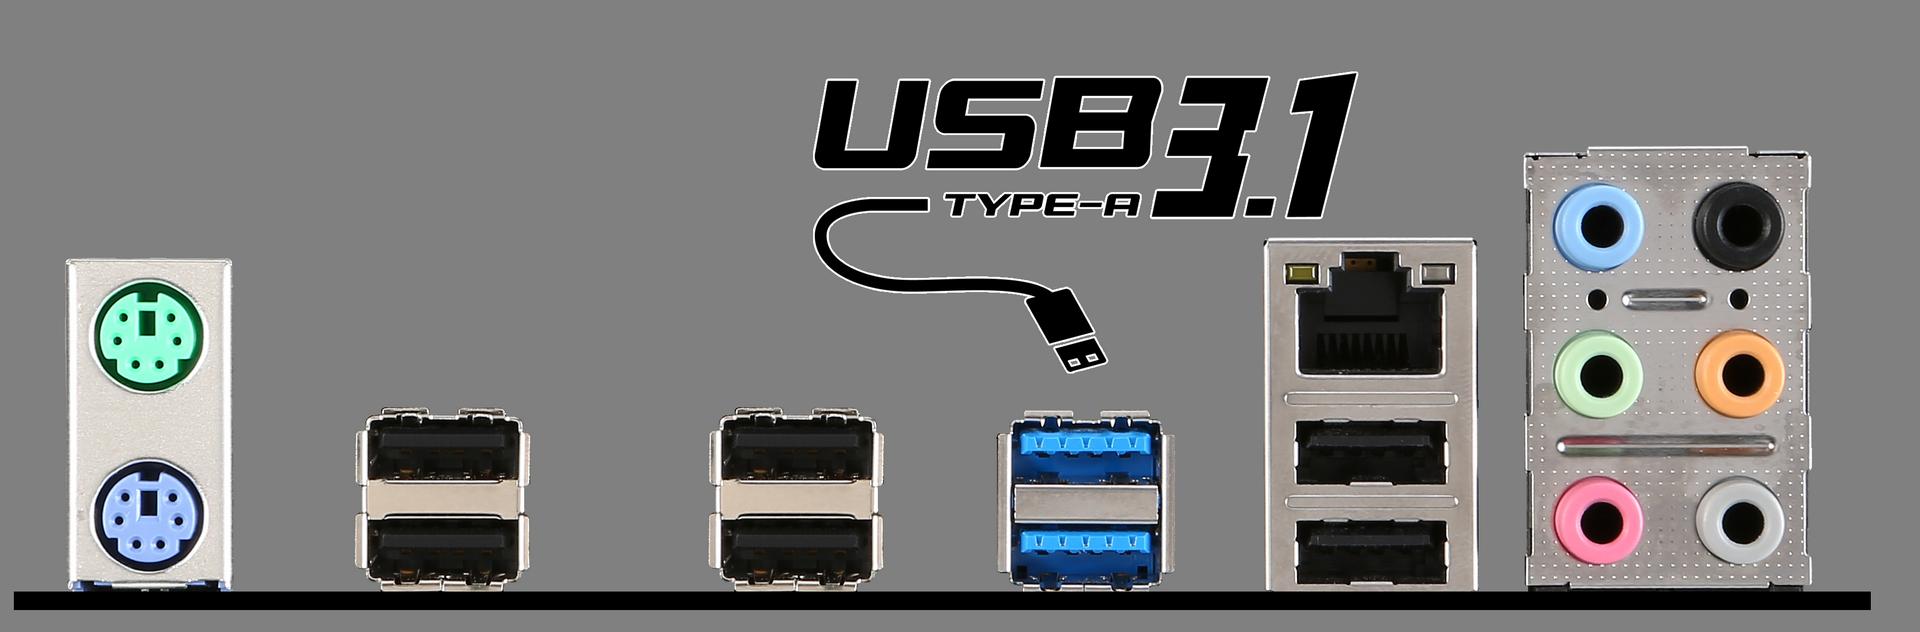 Driver UPDATE: MSI 970A SLI Krait Edition ASMedia USB 3.1